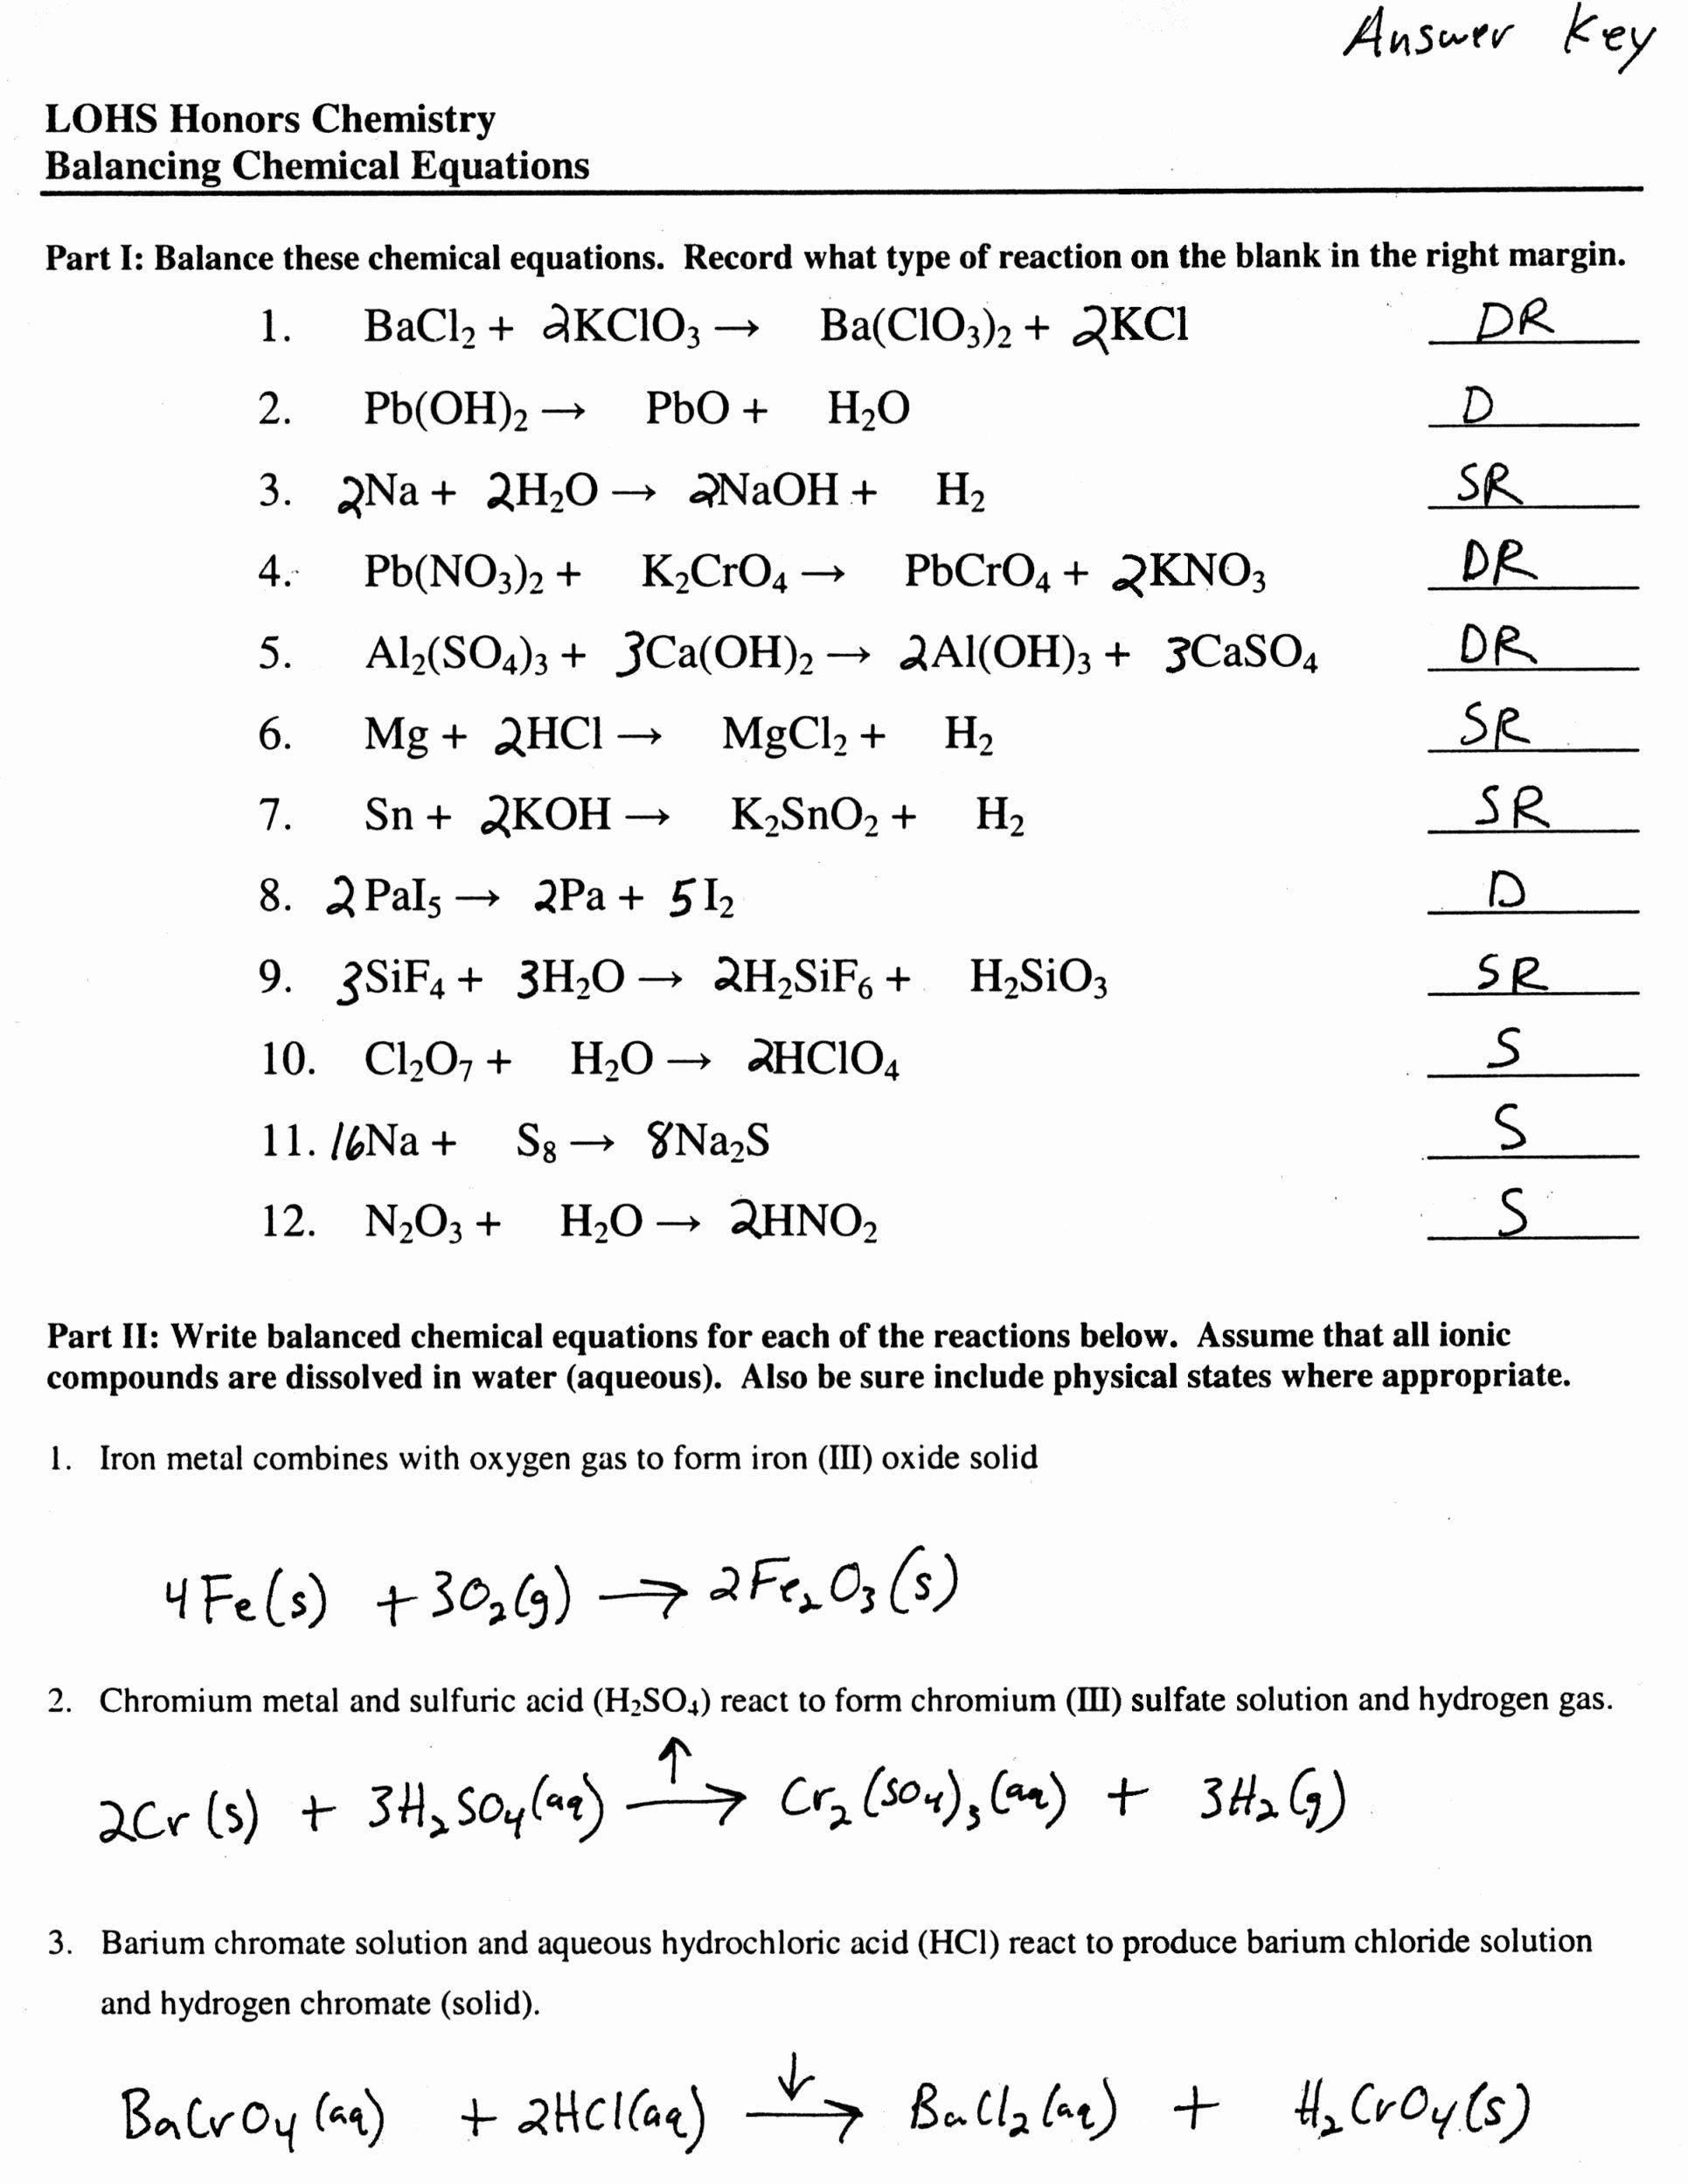 Nuclear Equations Worksheet Answers Elegant Balancing